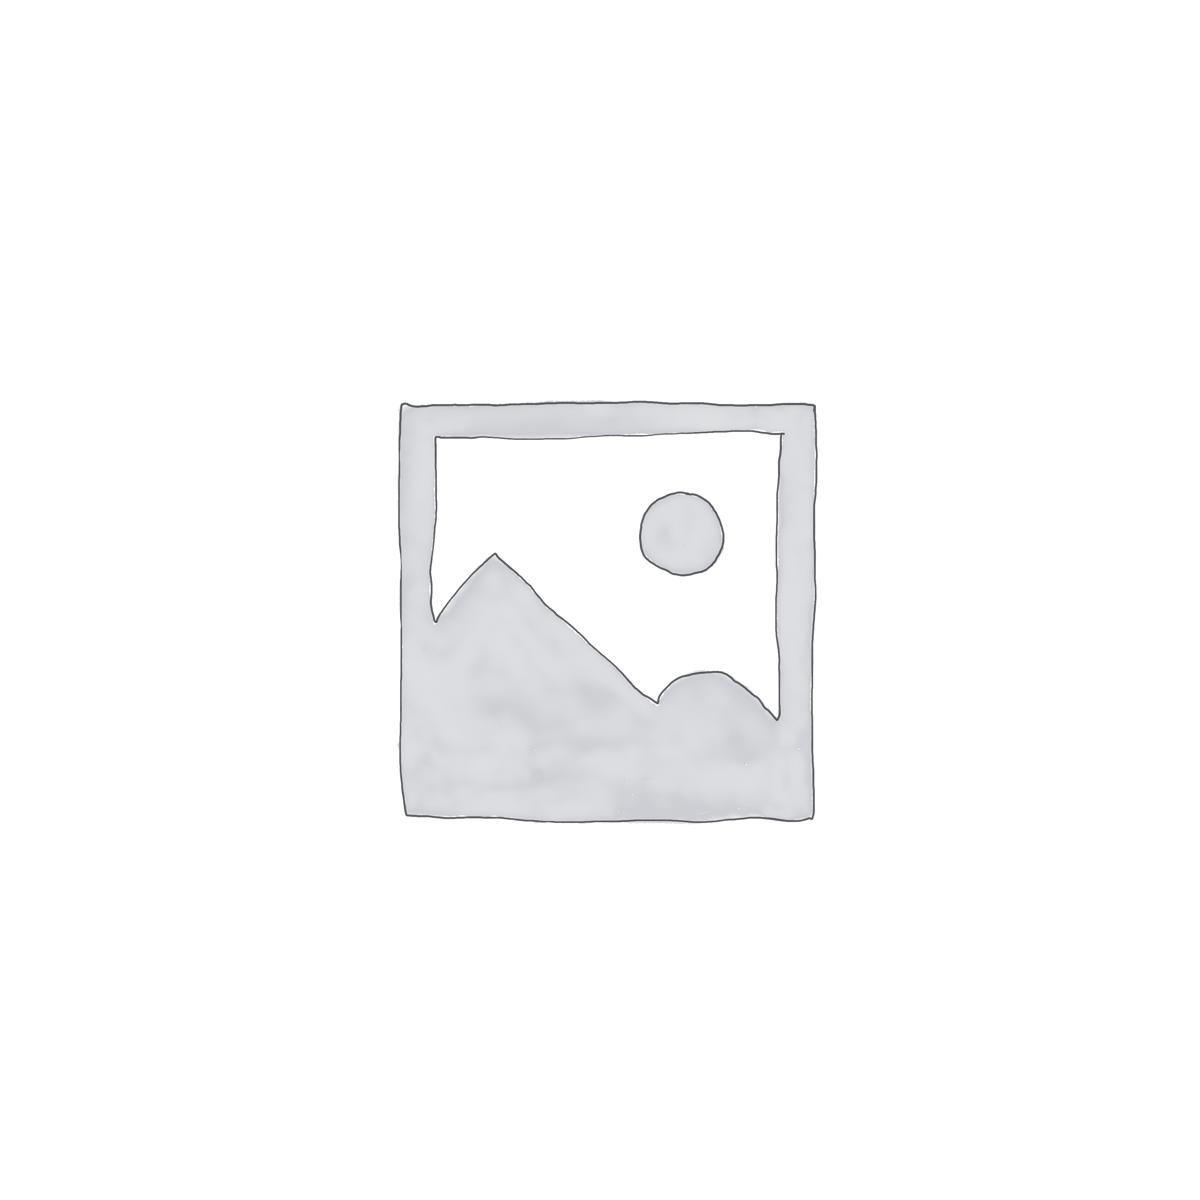 Dark Floral Tulip Lily Flowers Wallpaper Mural